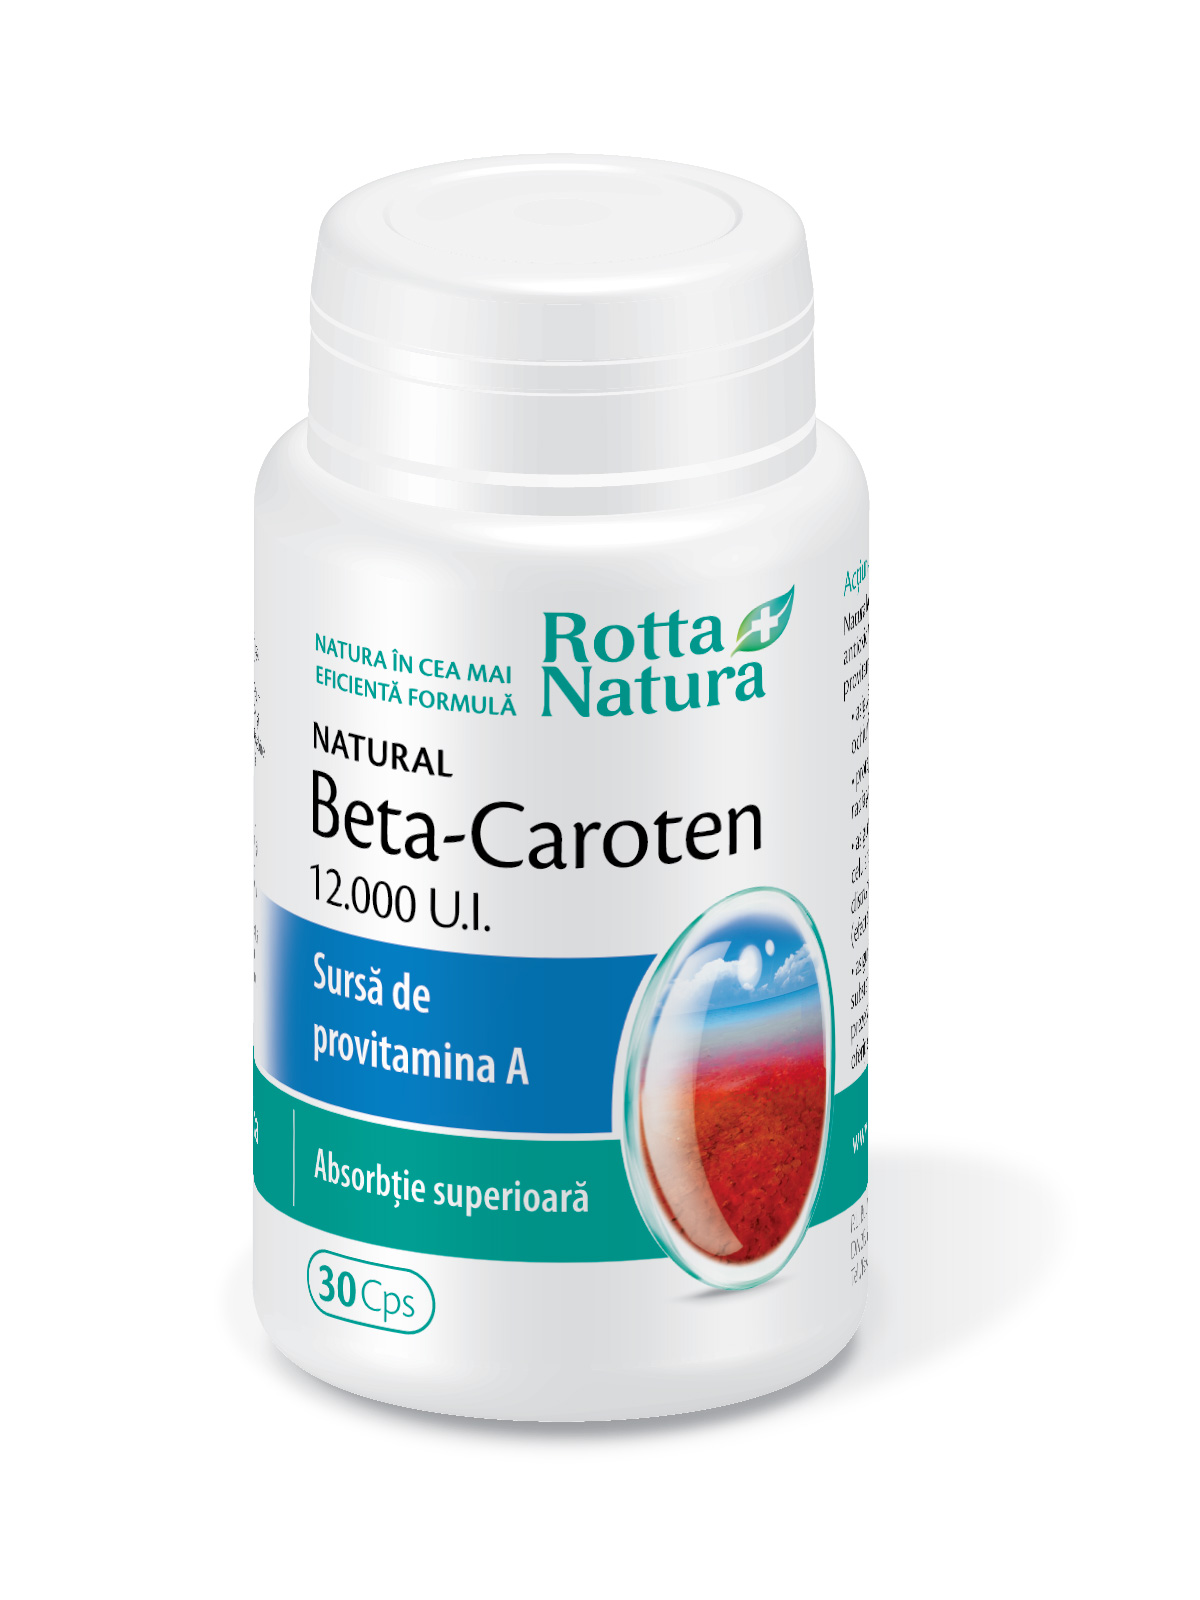 Beta-caroten natural